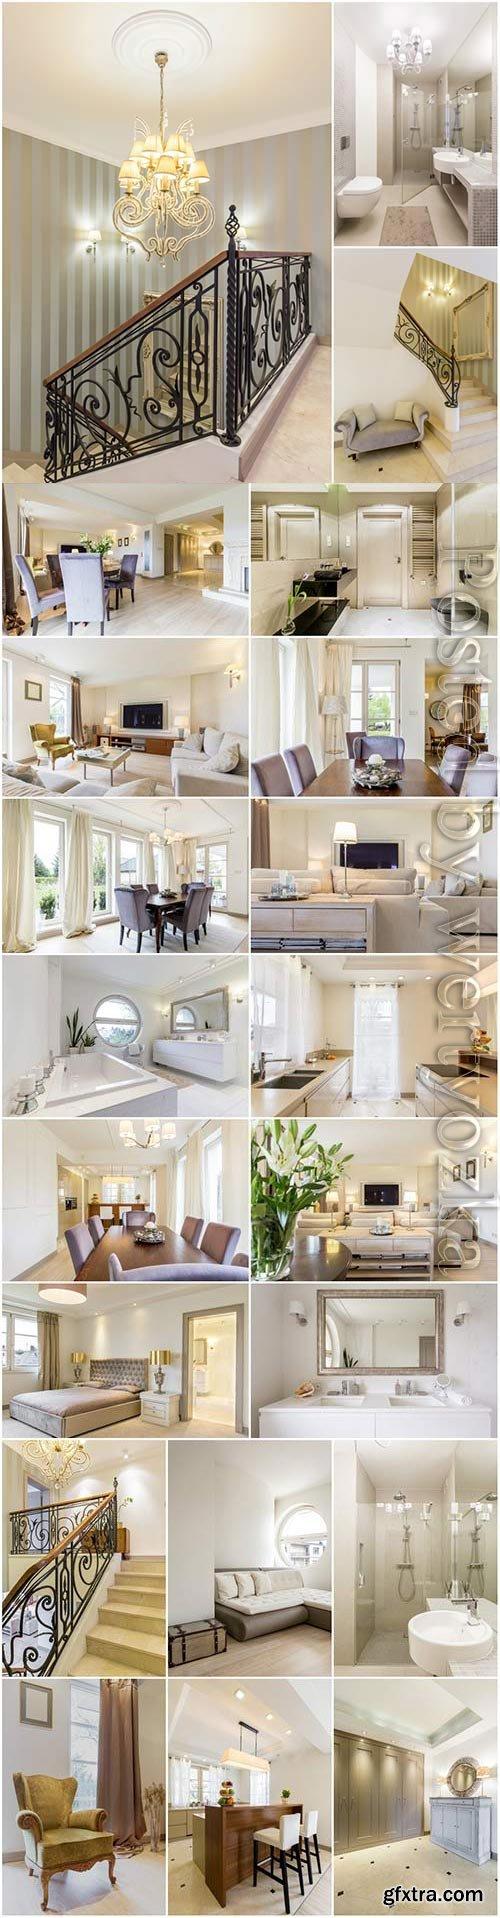 Luxury living room, bathroom and kitchen interior stock photo